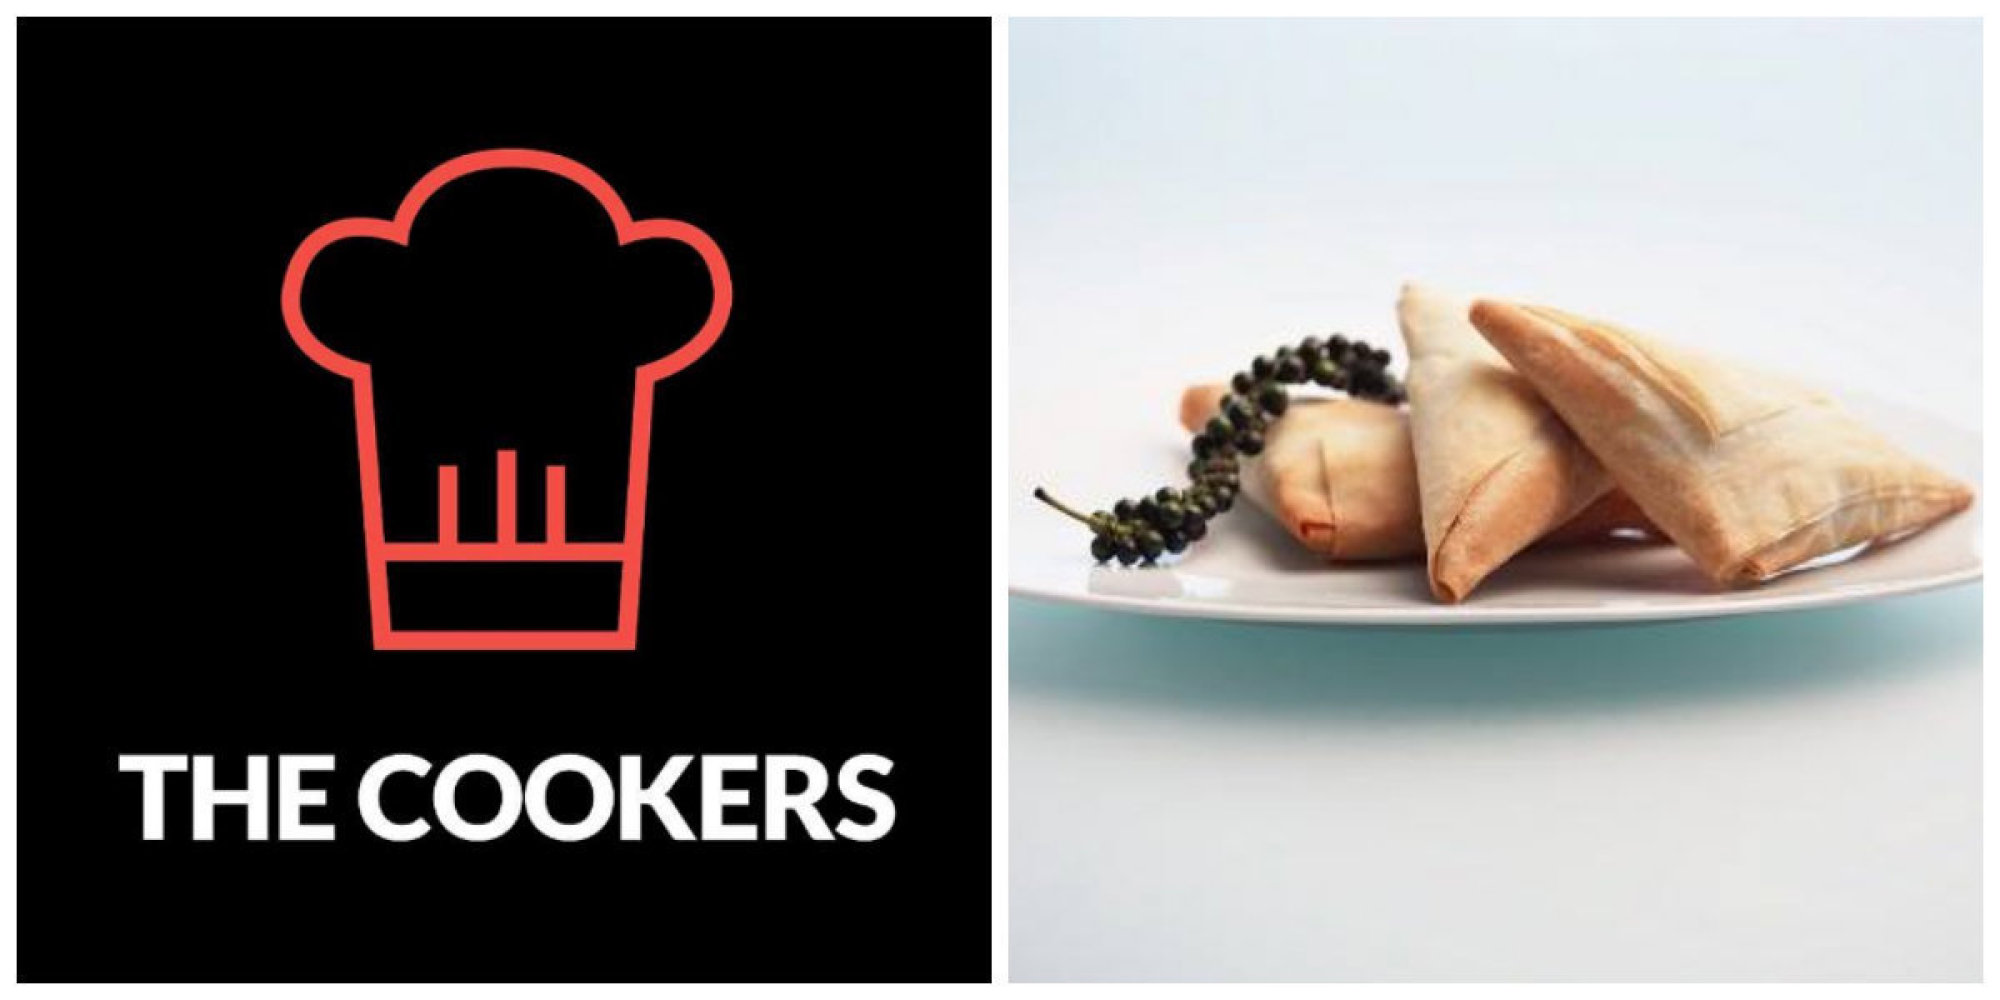 the cookers le uber de la cuisine se lance casablanca. Black Bedroom Furniture Sets. Home Design Ideas